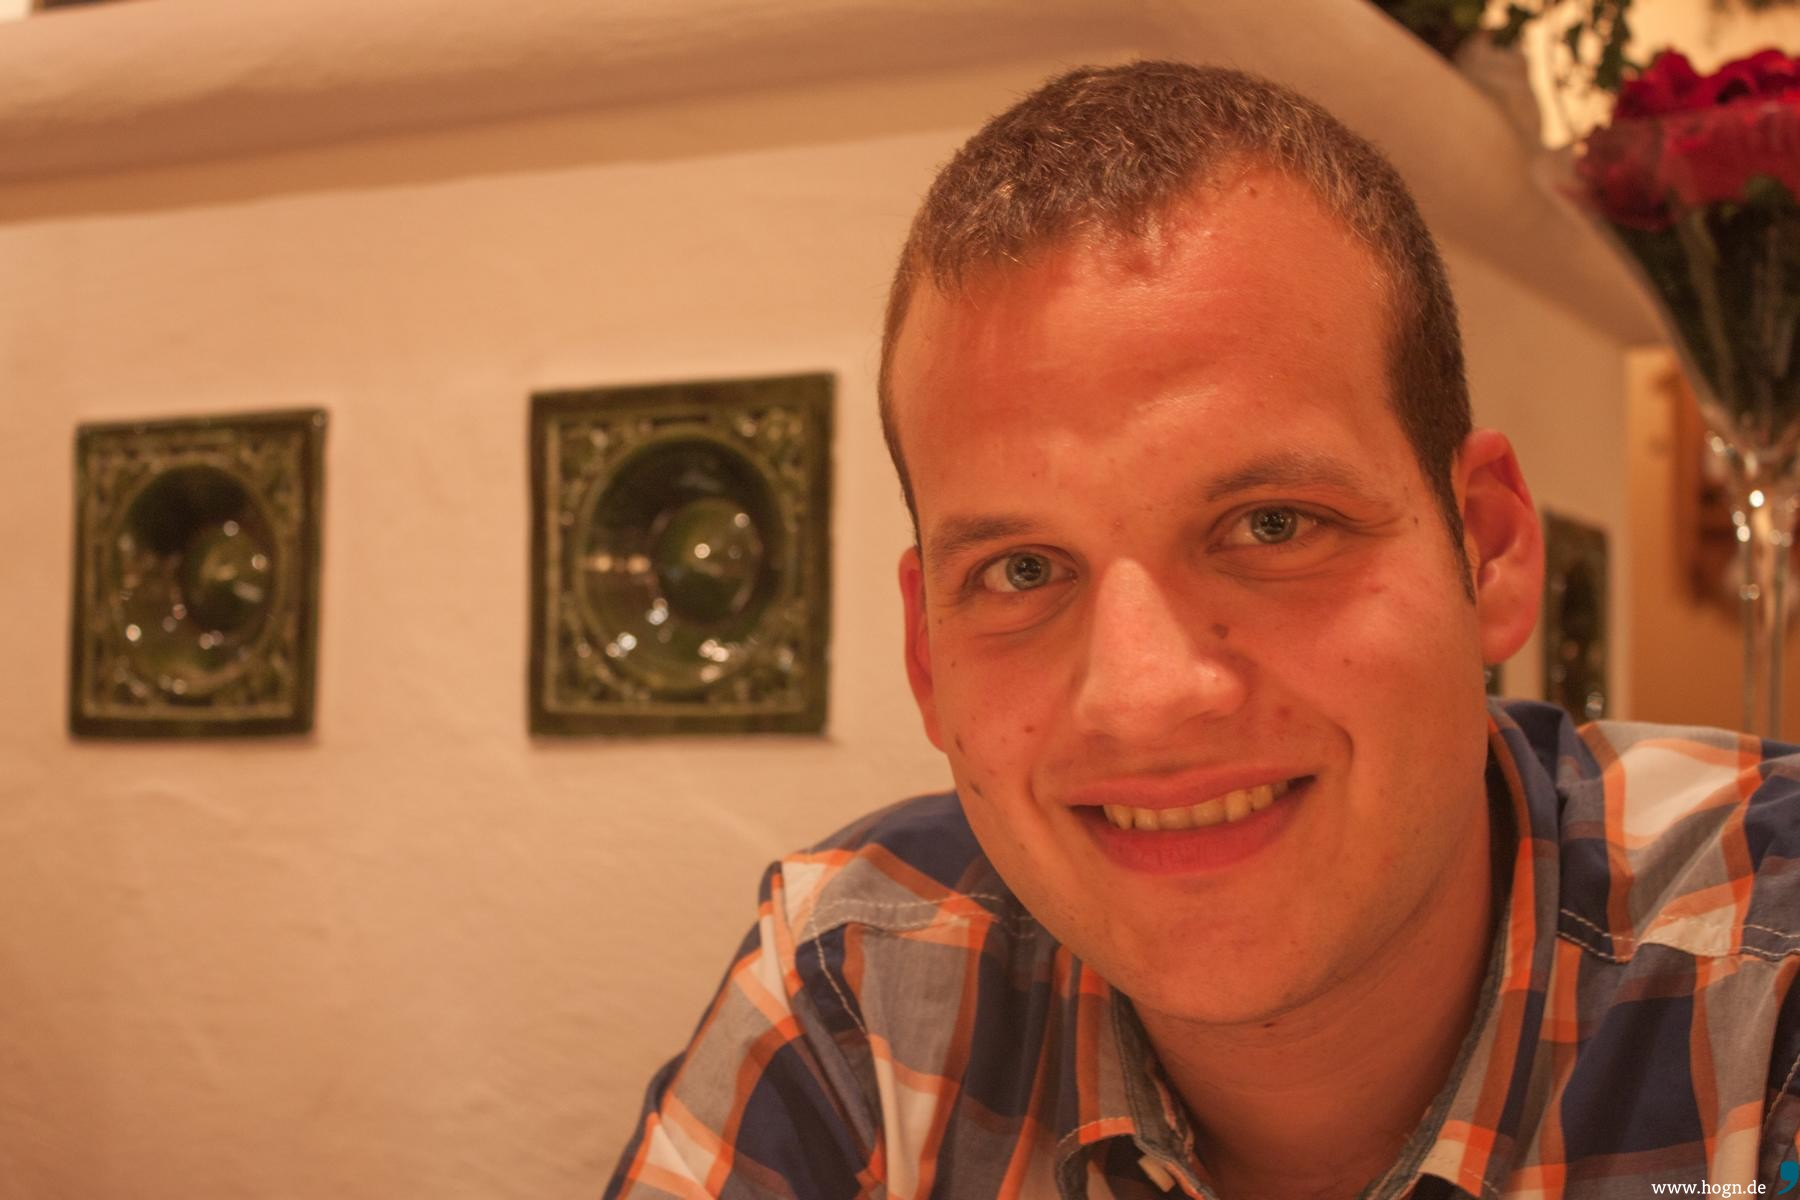 Helmut Weigerstorfer, 22, Herzogsreut